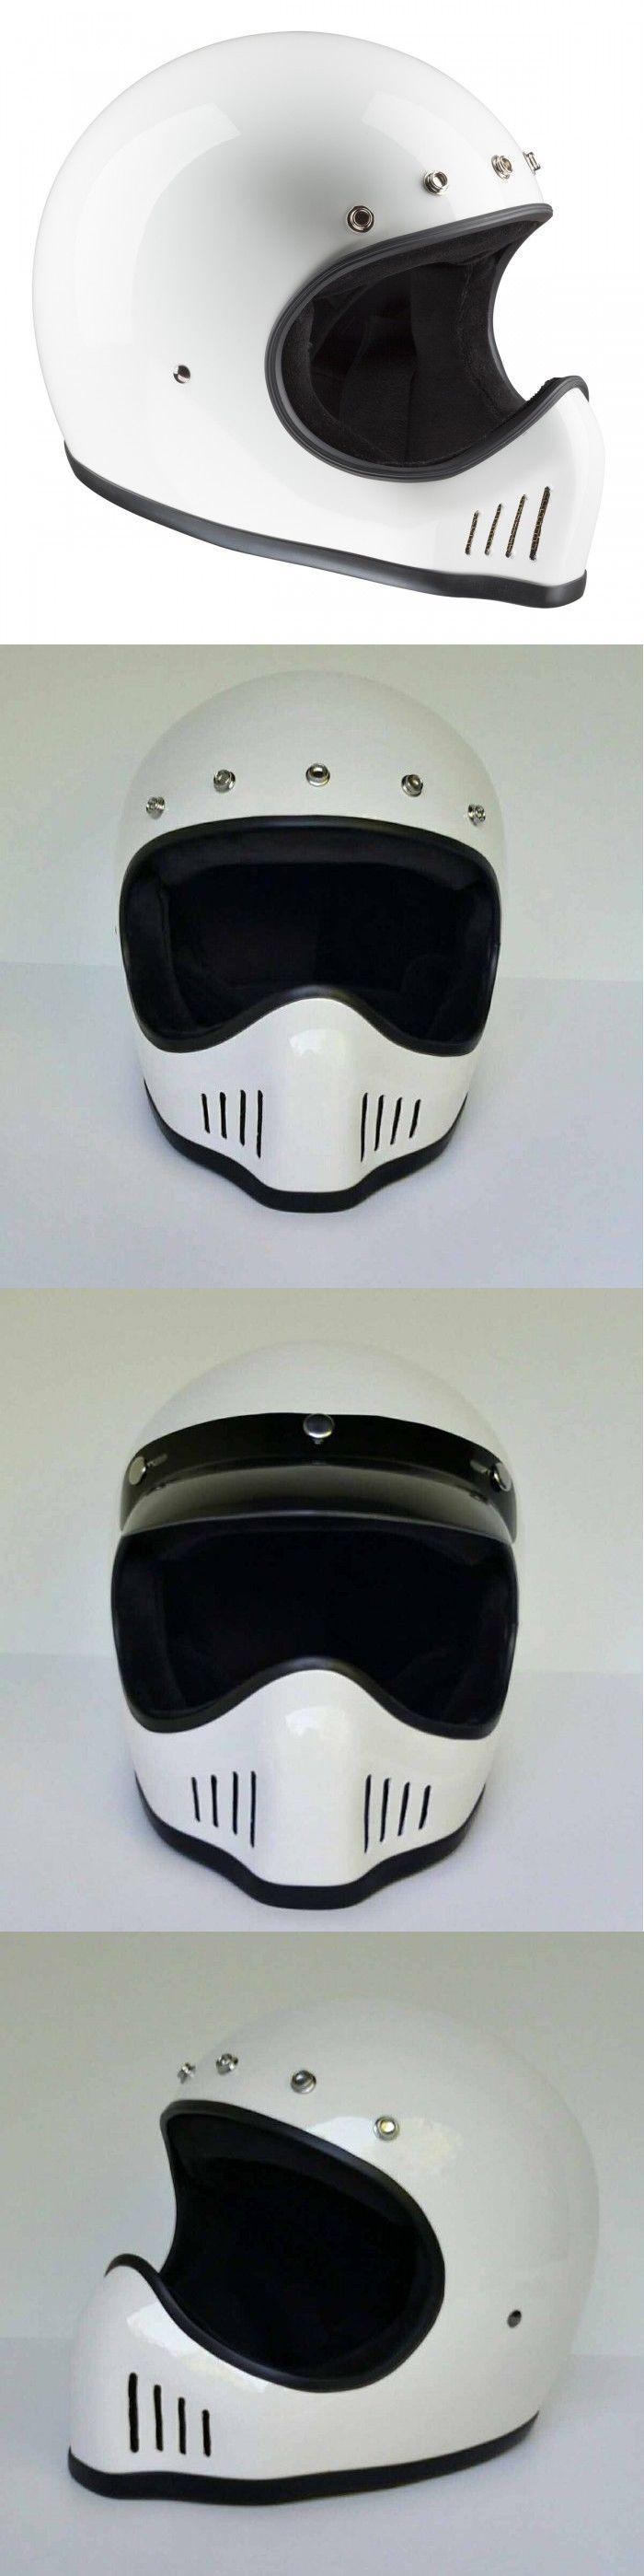 Helmet Accessories 177865: Bandit Historic Mx Motorcycle Helmet Cross Supermoto Hill Climbing Fibreglass BUY IT NOW ONLY: $208.3